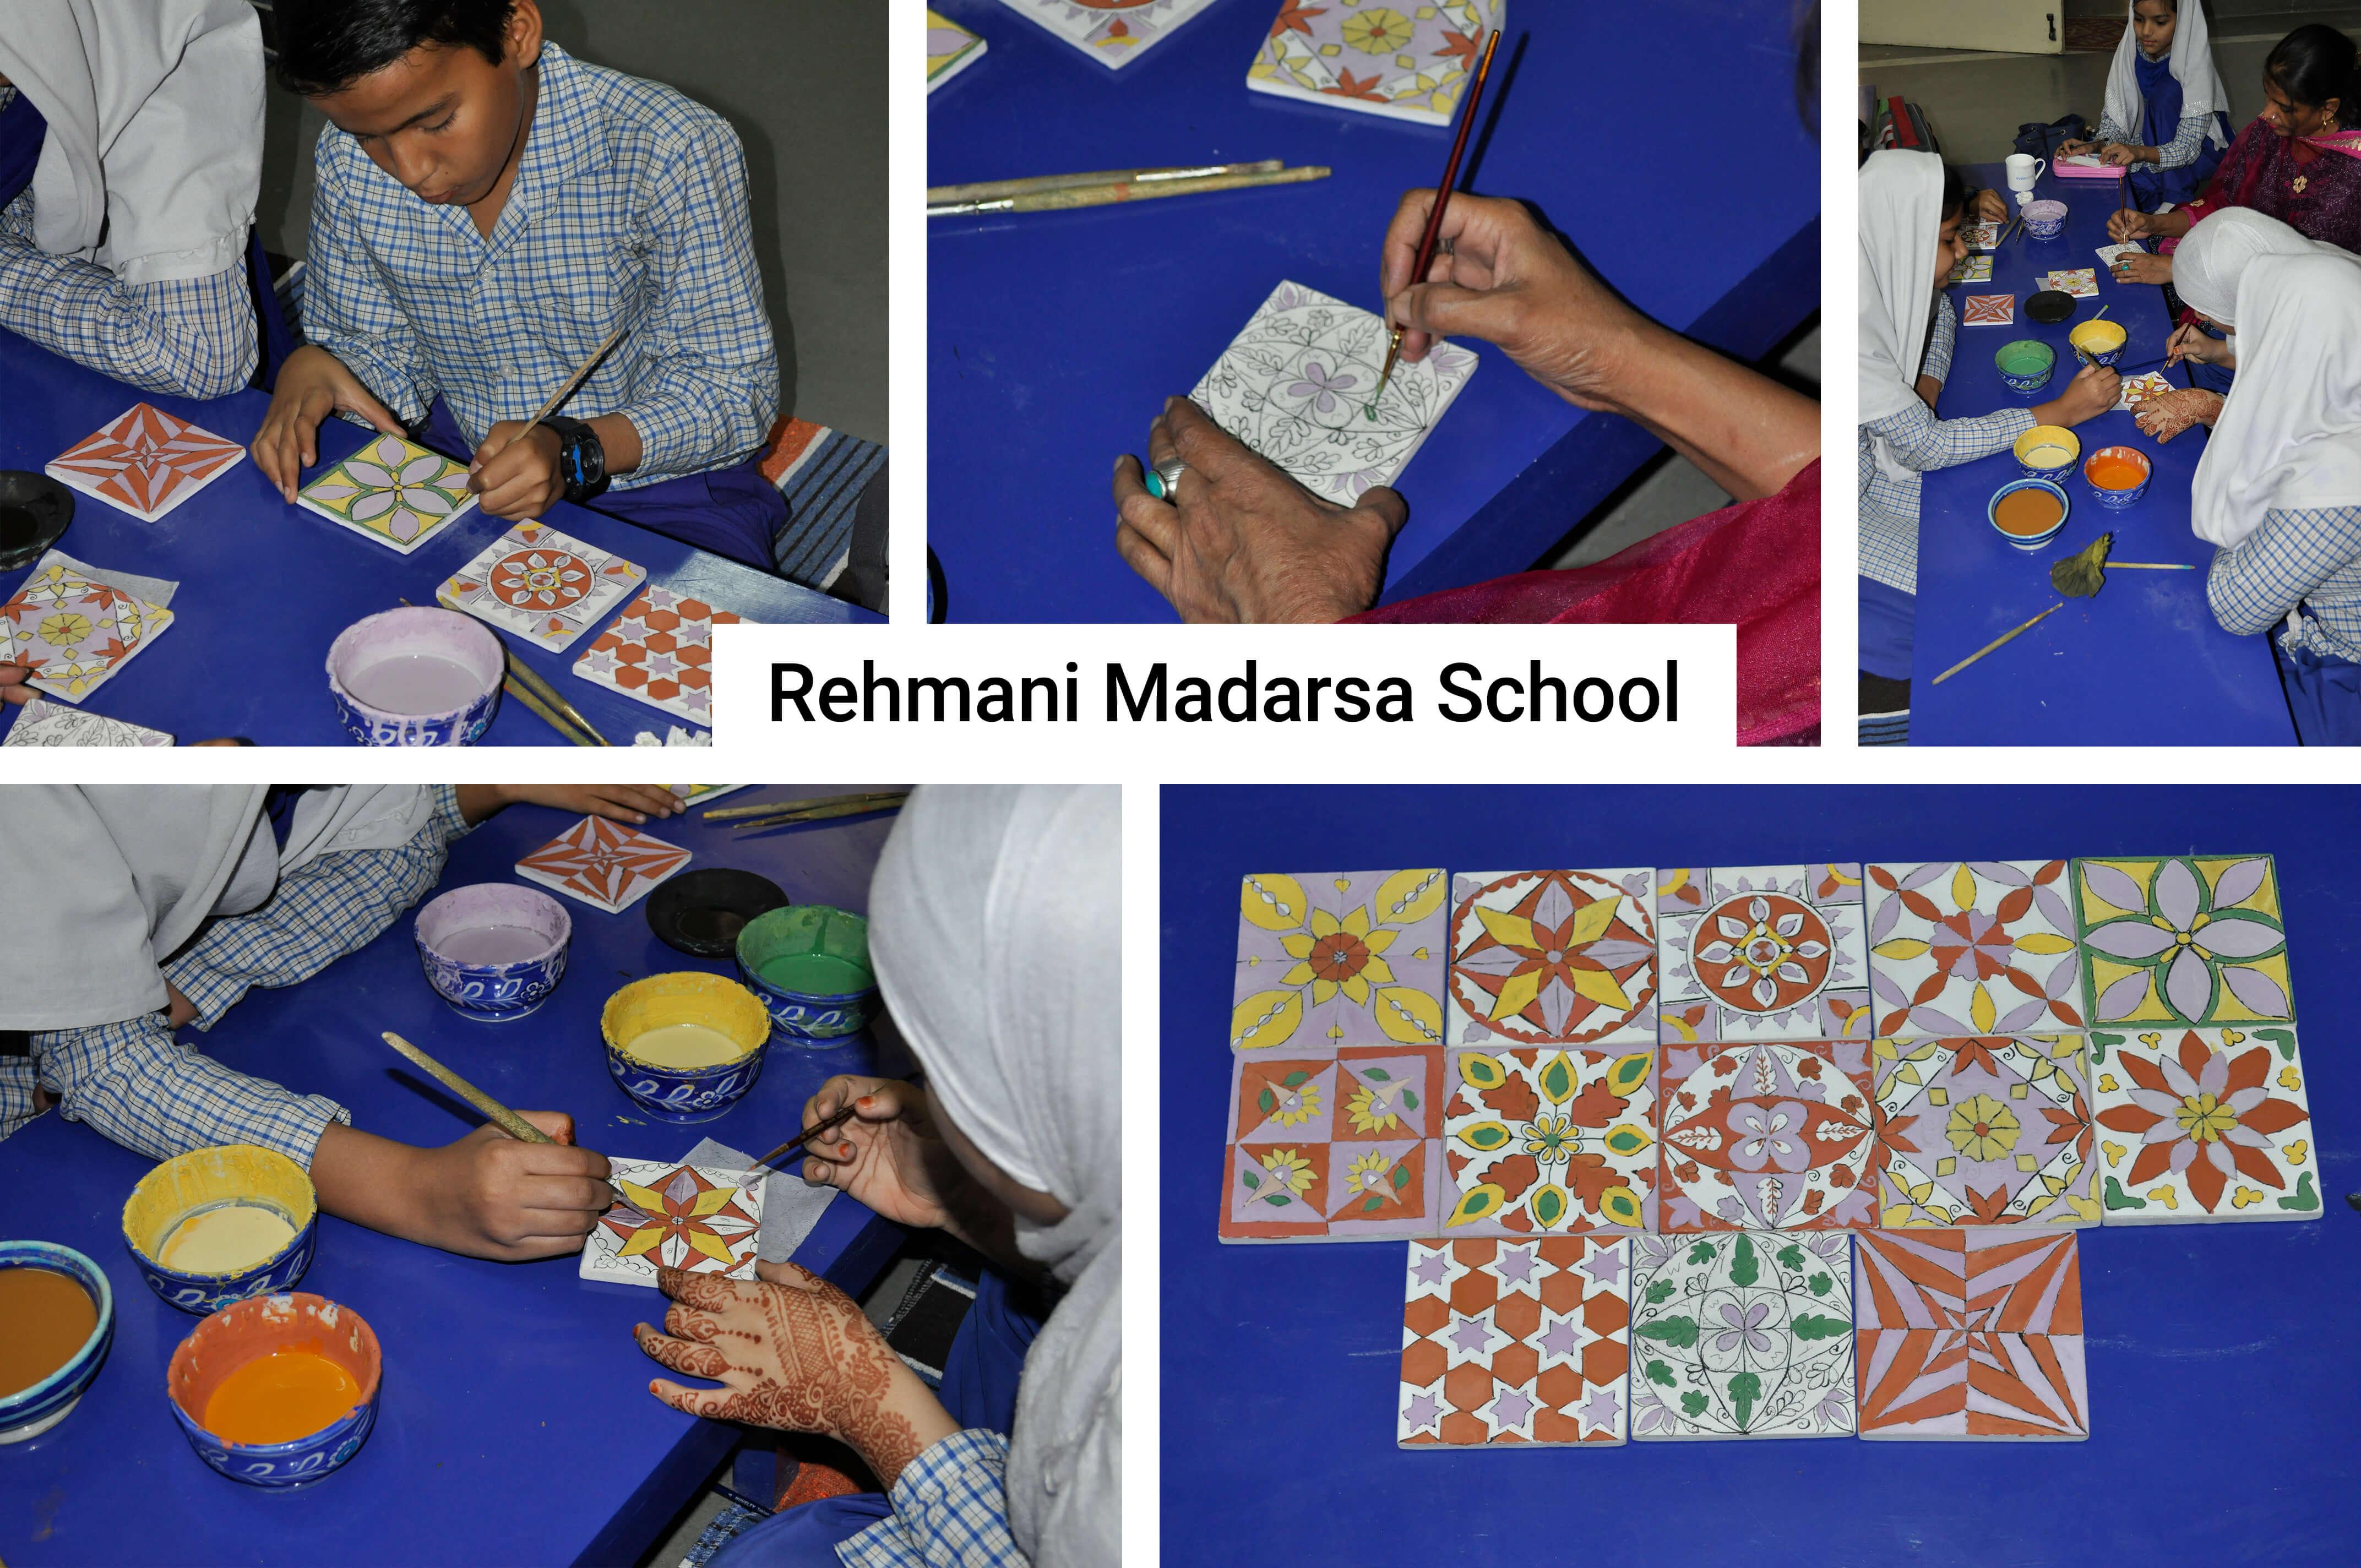 Rehmani Madrassa